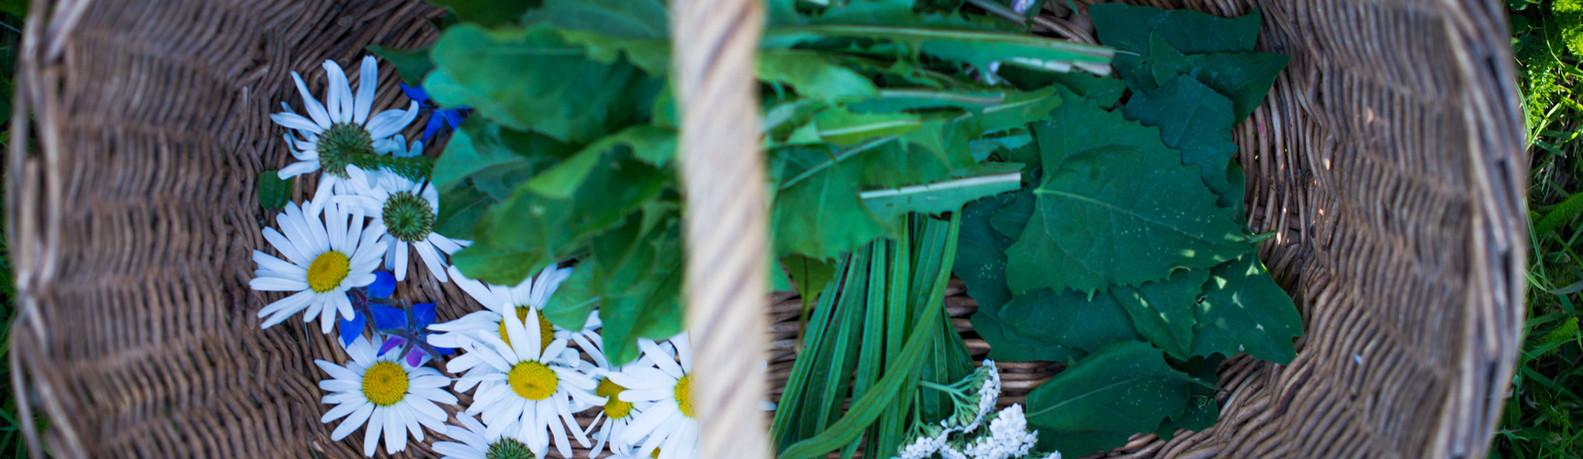 Cueillette de Plantes SauvagesAAEBD19©_Naïade_Plante-53